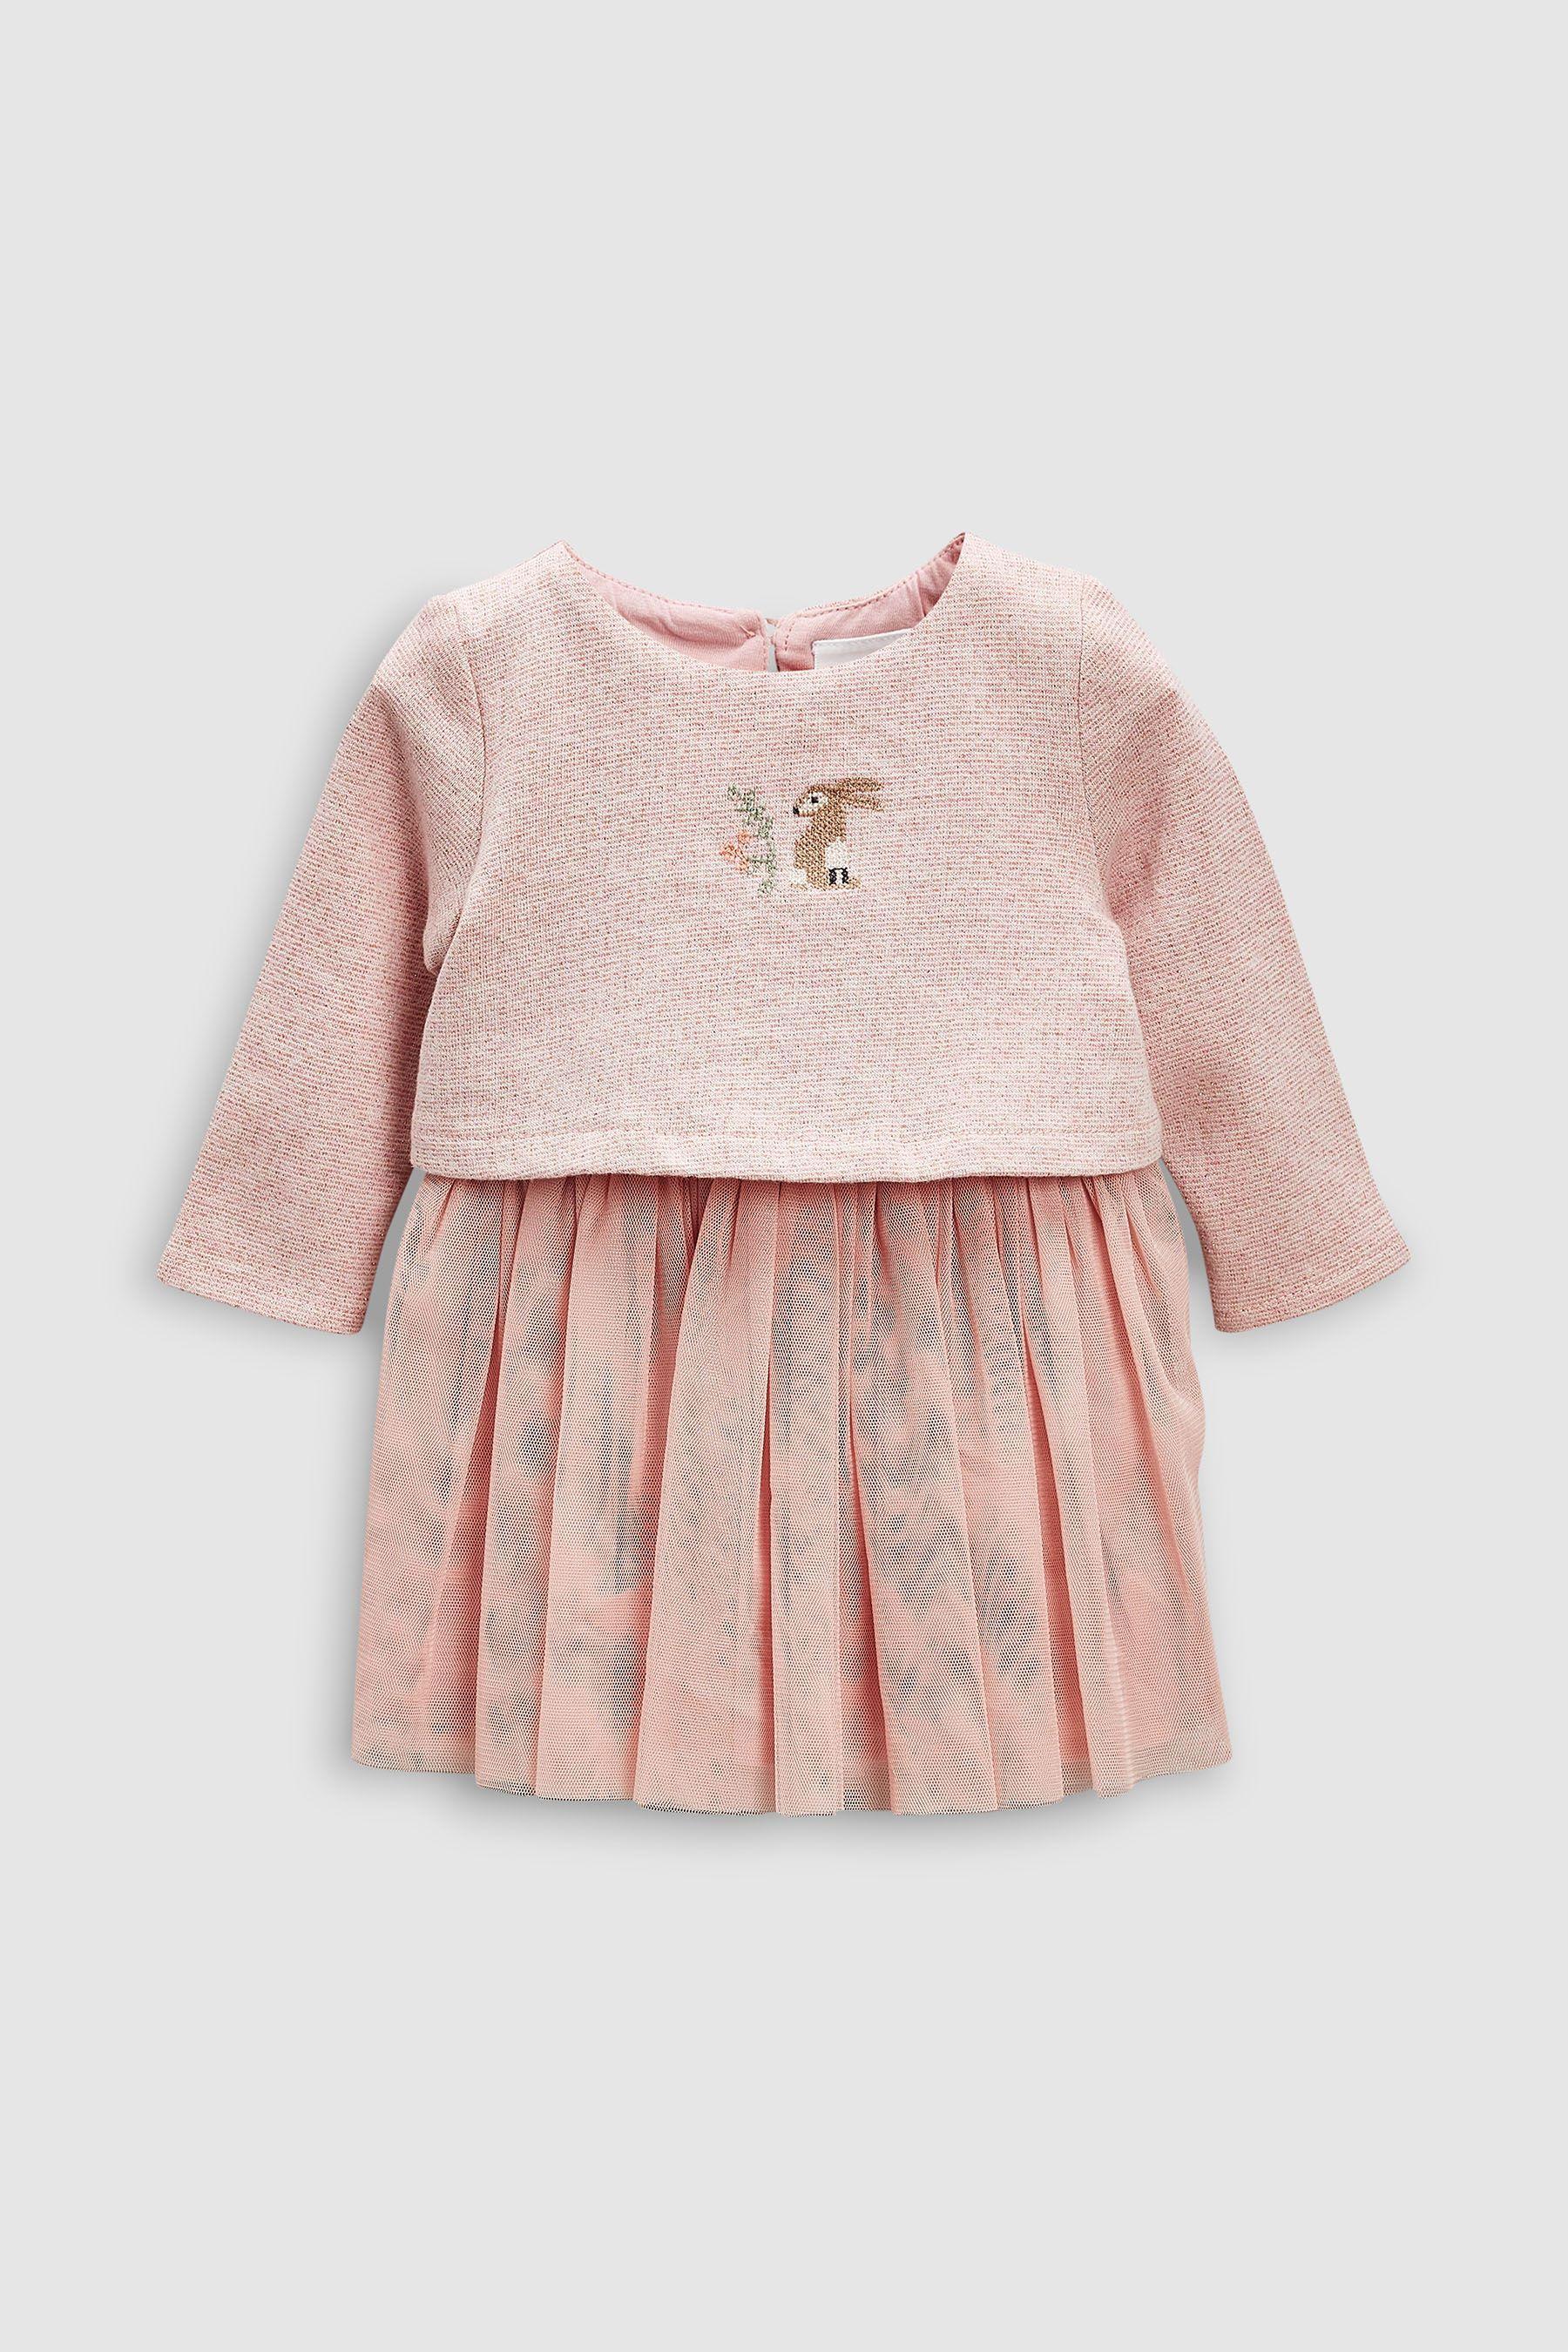 b54961f03 Girls Next Pink Bunny Tutu Dress (0mths-2yrs) - Pink